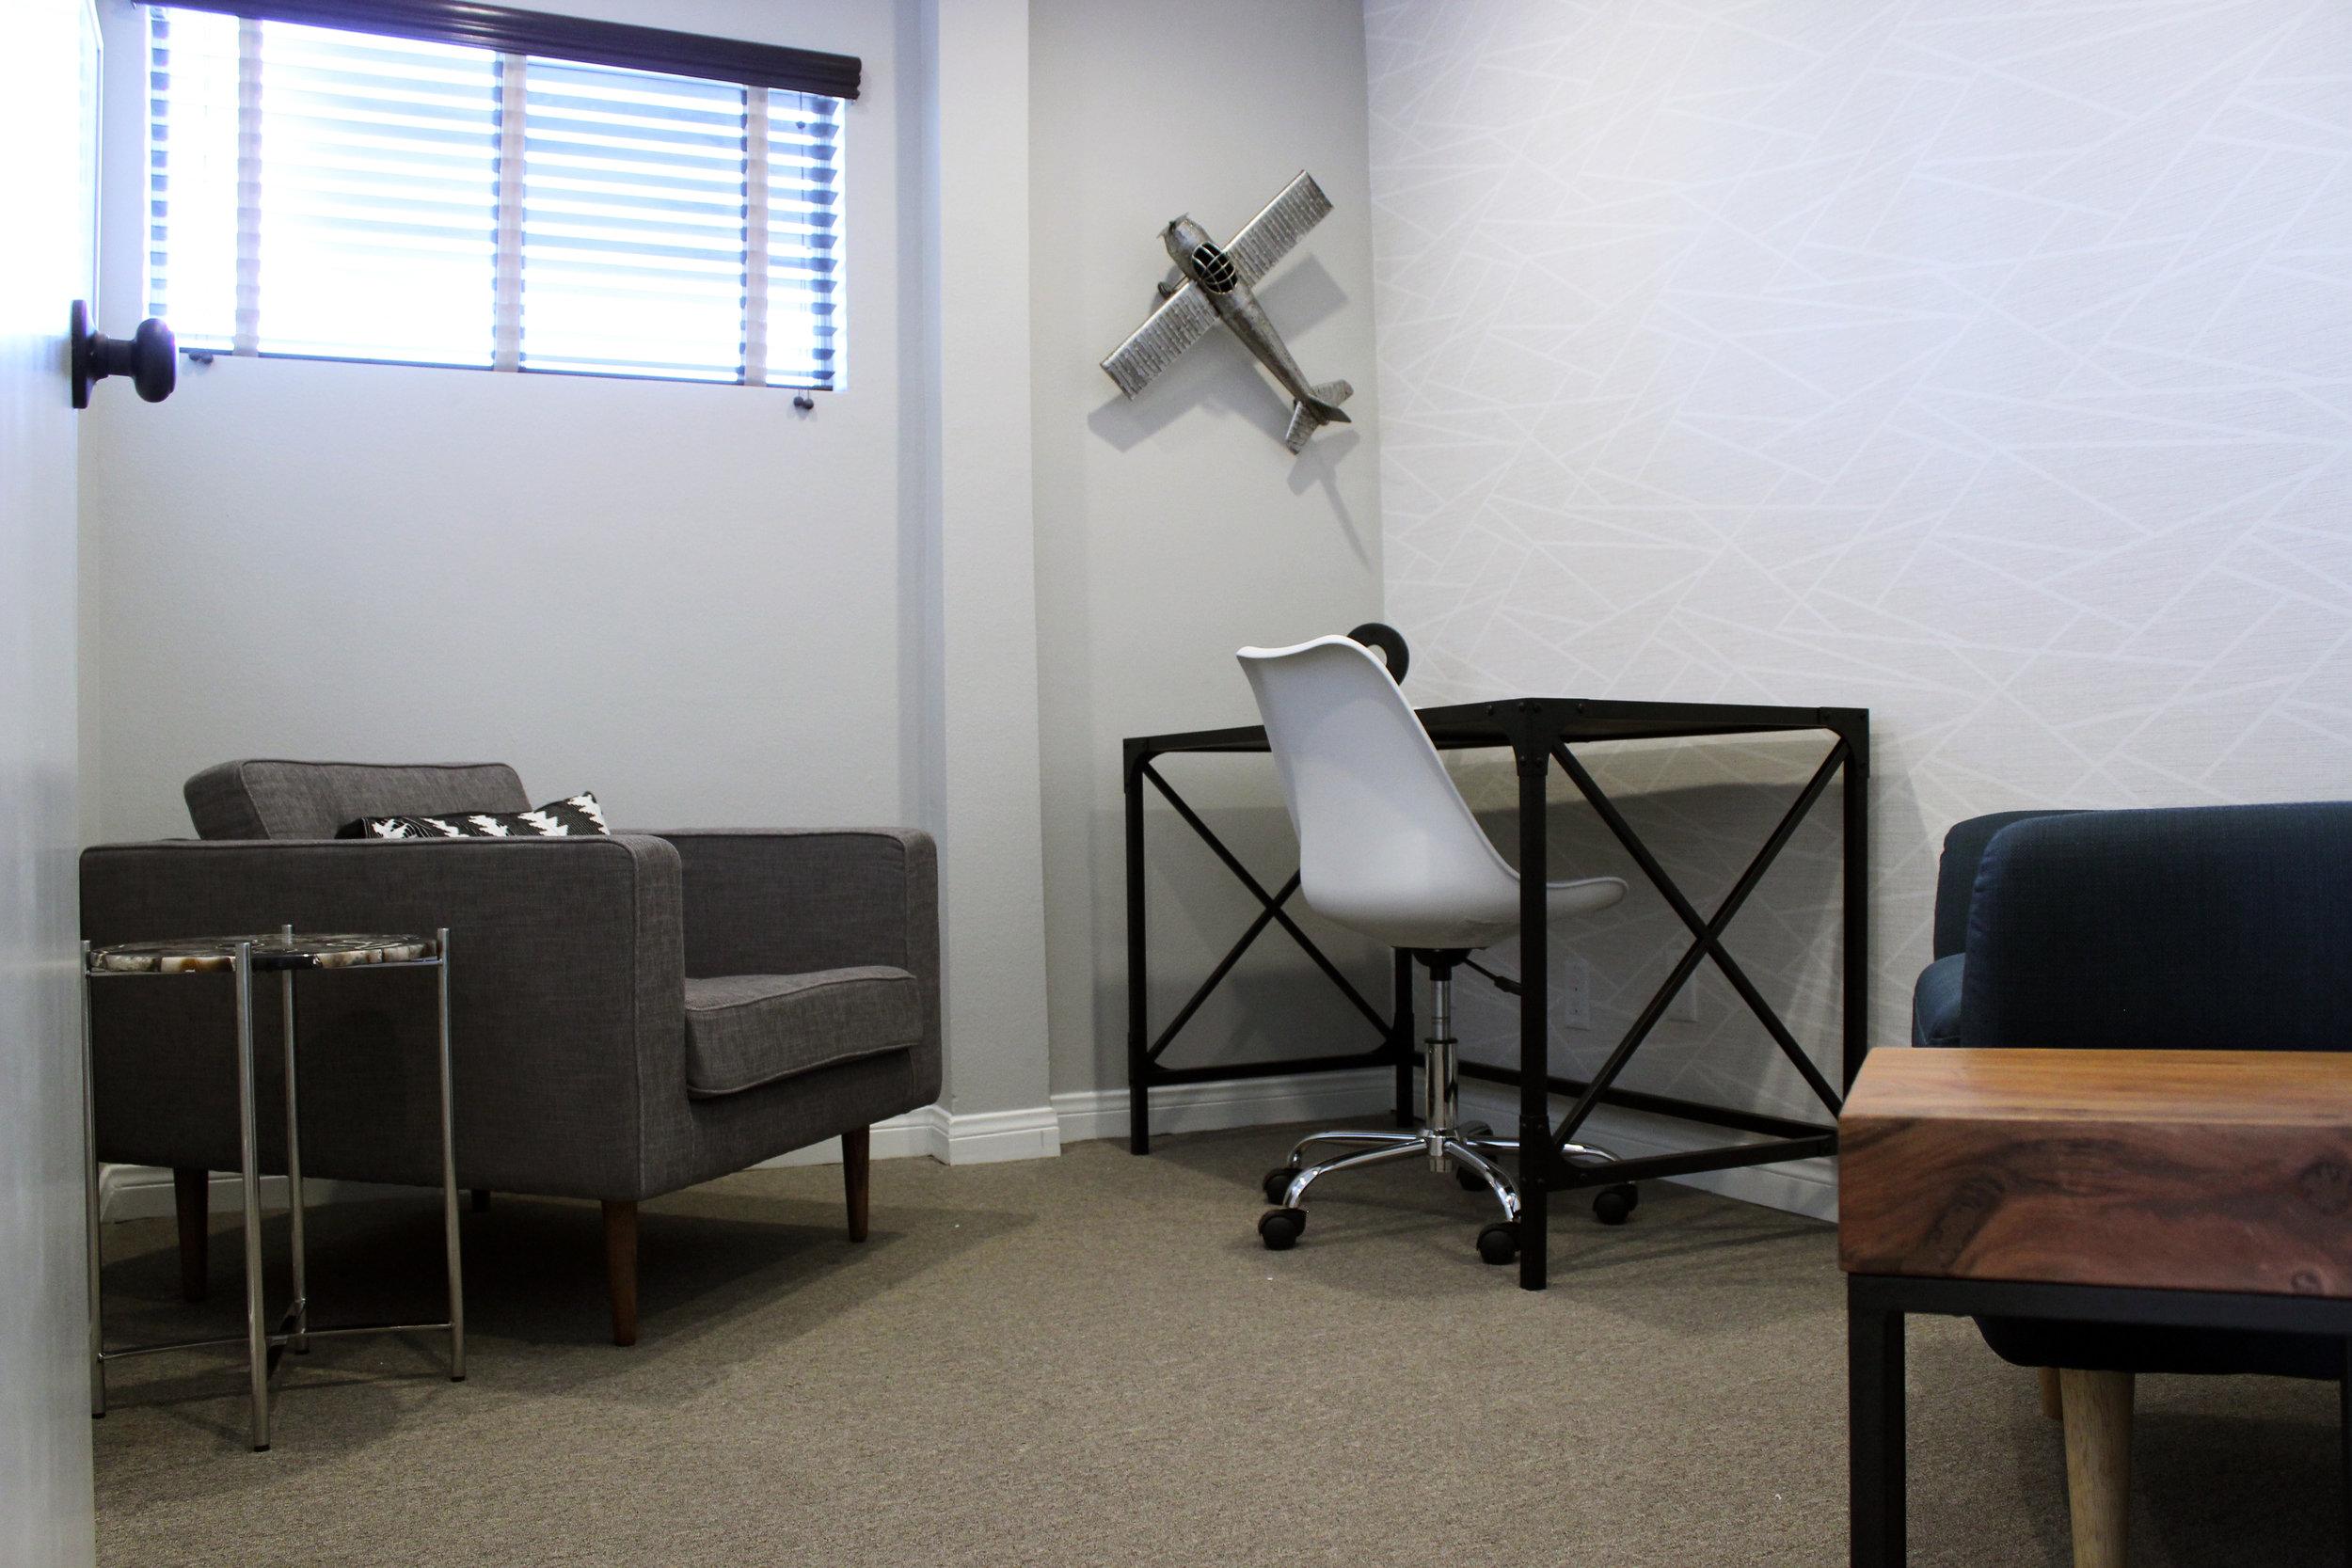 therapyroomtry2.jpg